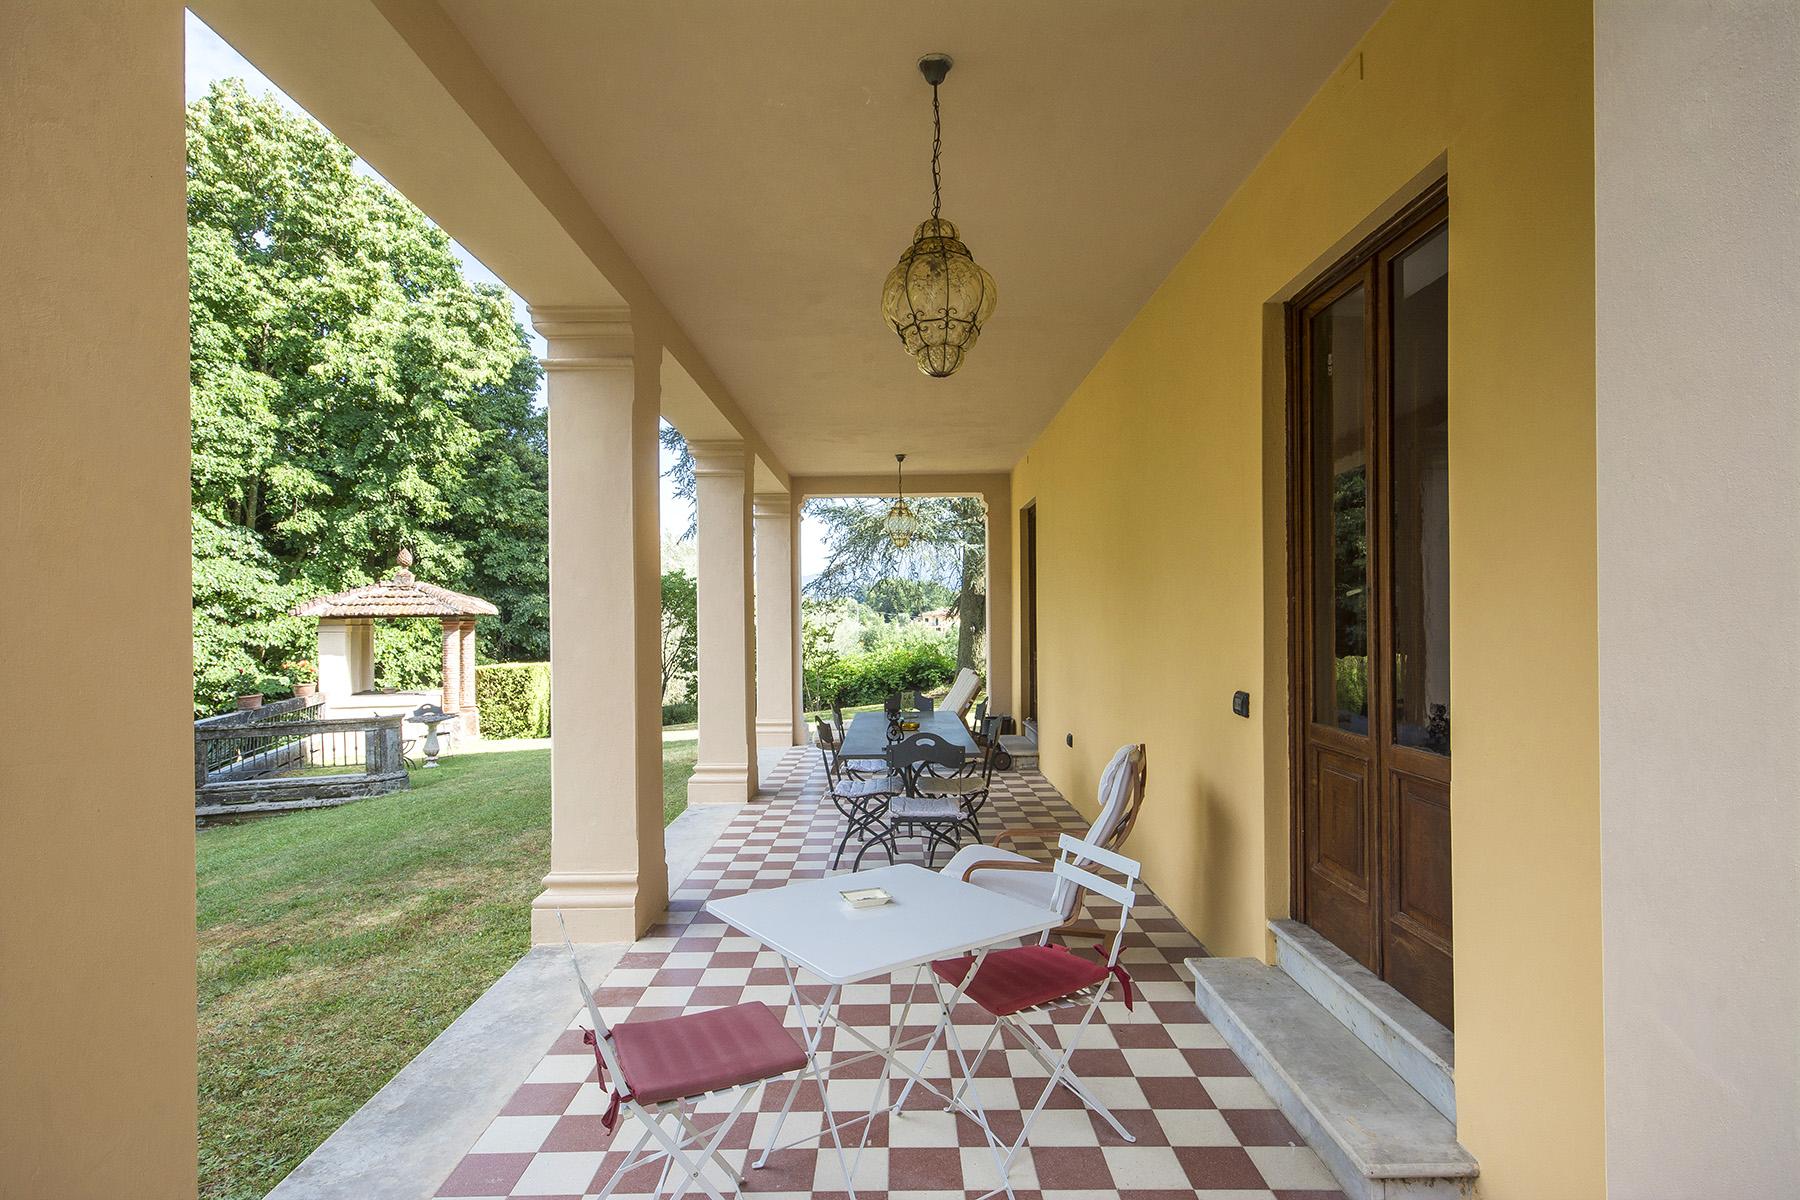 Villa in Vendita a Lucca: 5 locali, 1150 mq - Foto 4